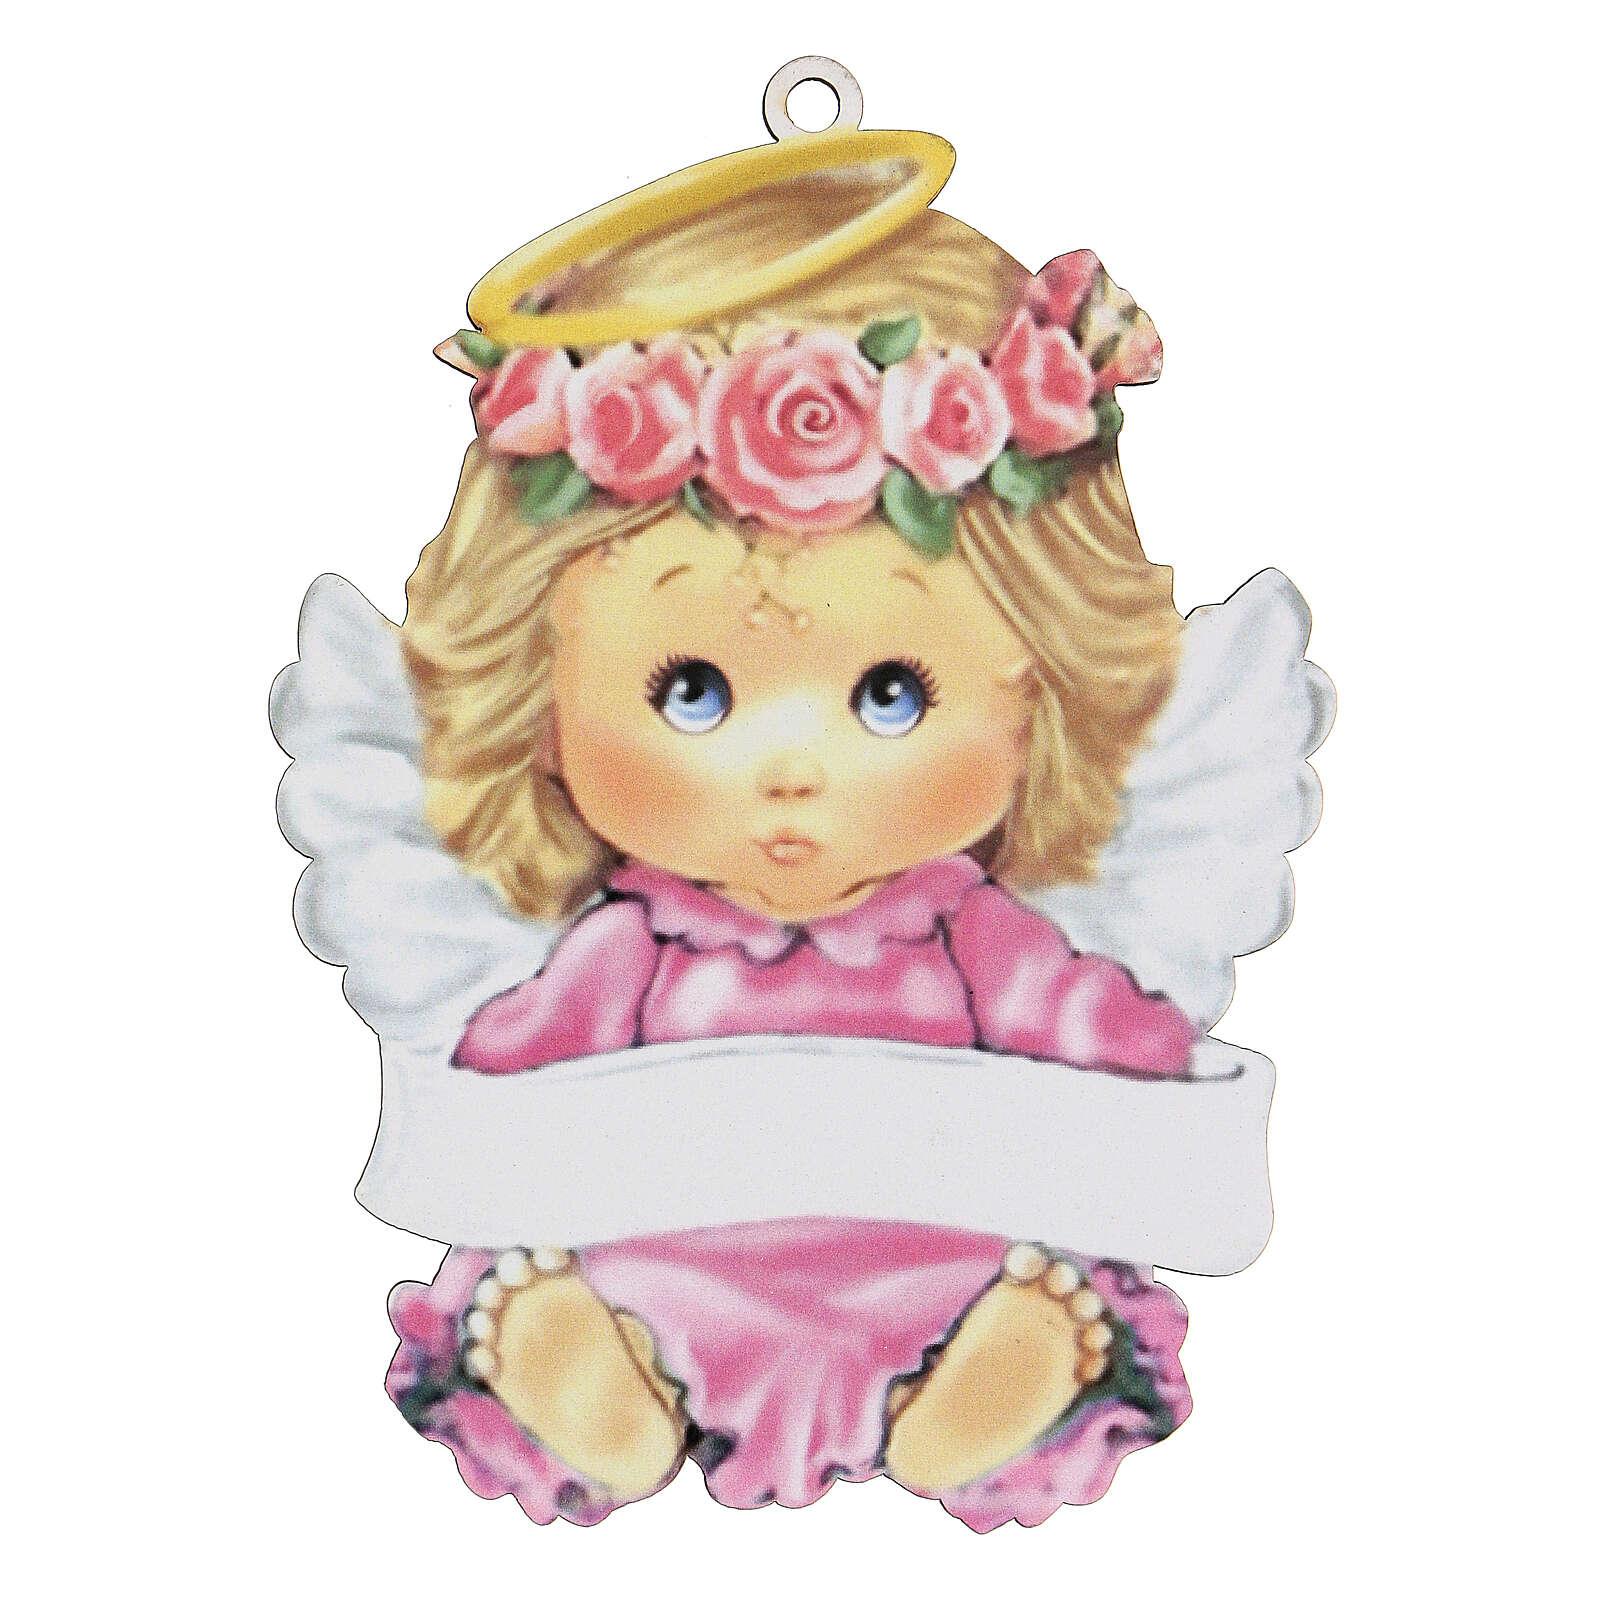 Angelo rosa 15 cm bimba 3